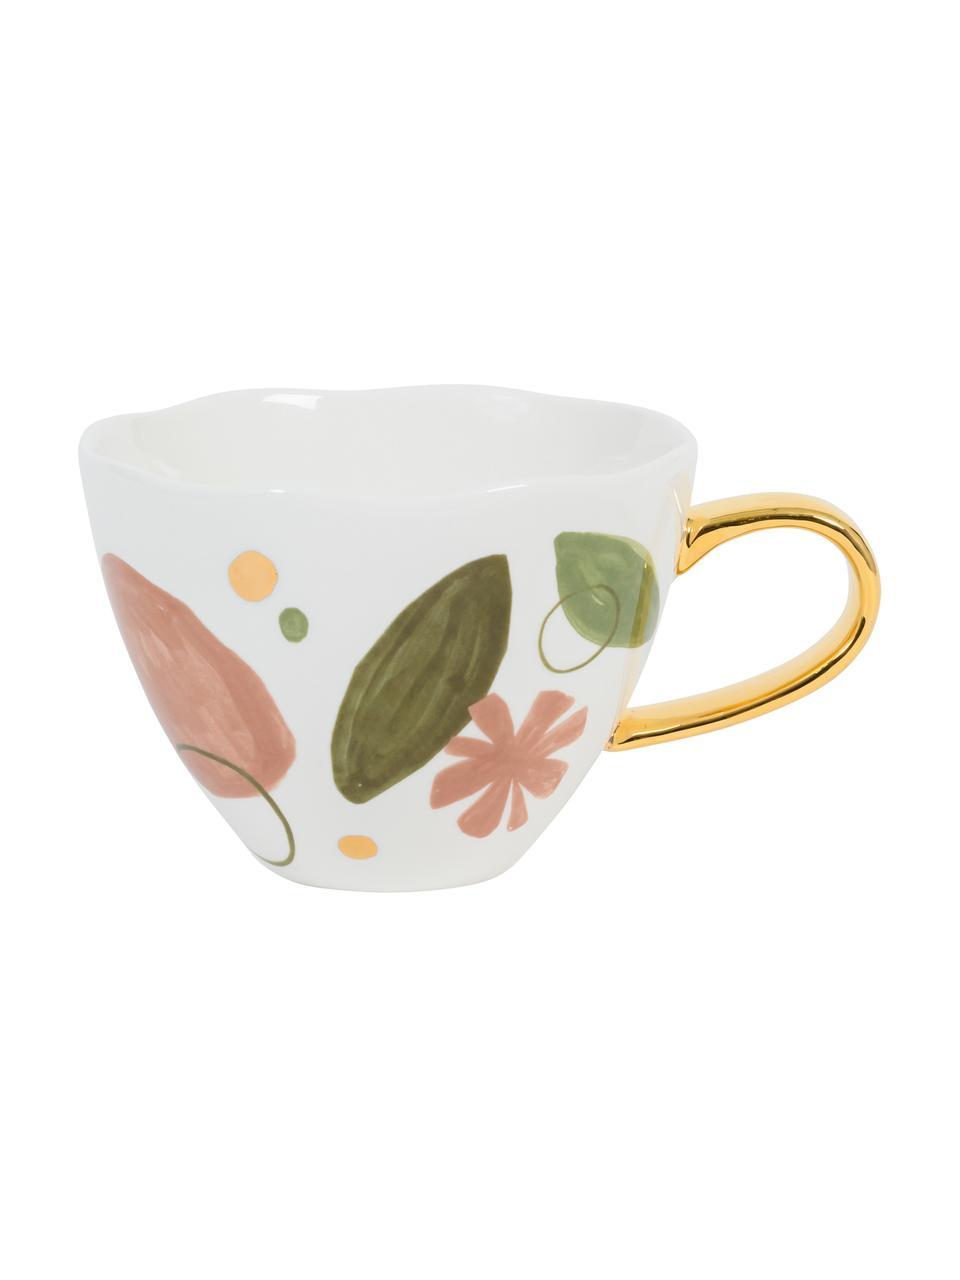 Tasse Good Morning, bunt bemalt mit goldfarbenem Griff, New Bone China, Weiß, Rosa, Grün, Goldfarben, Ø 11 x H 9 cm